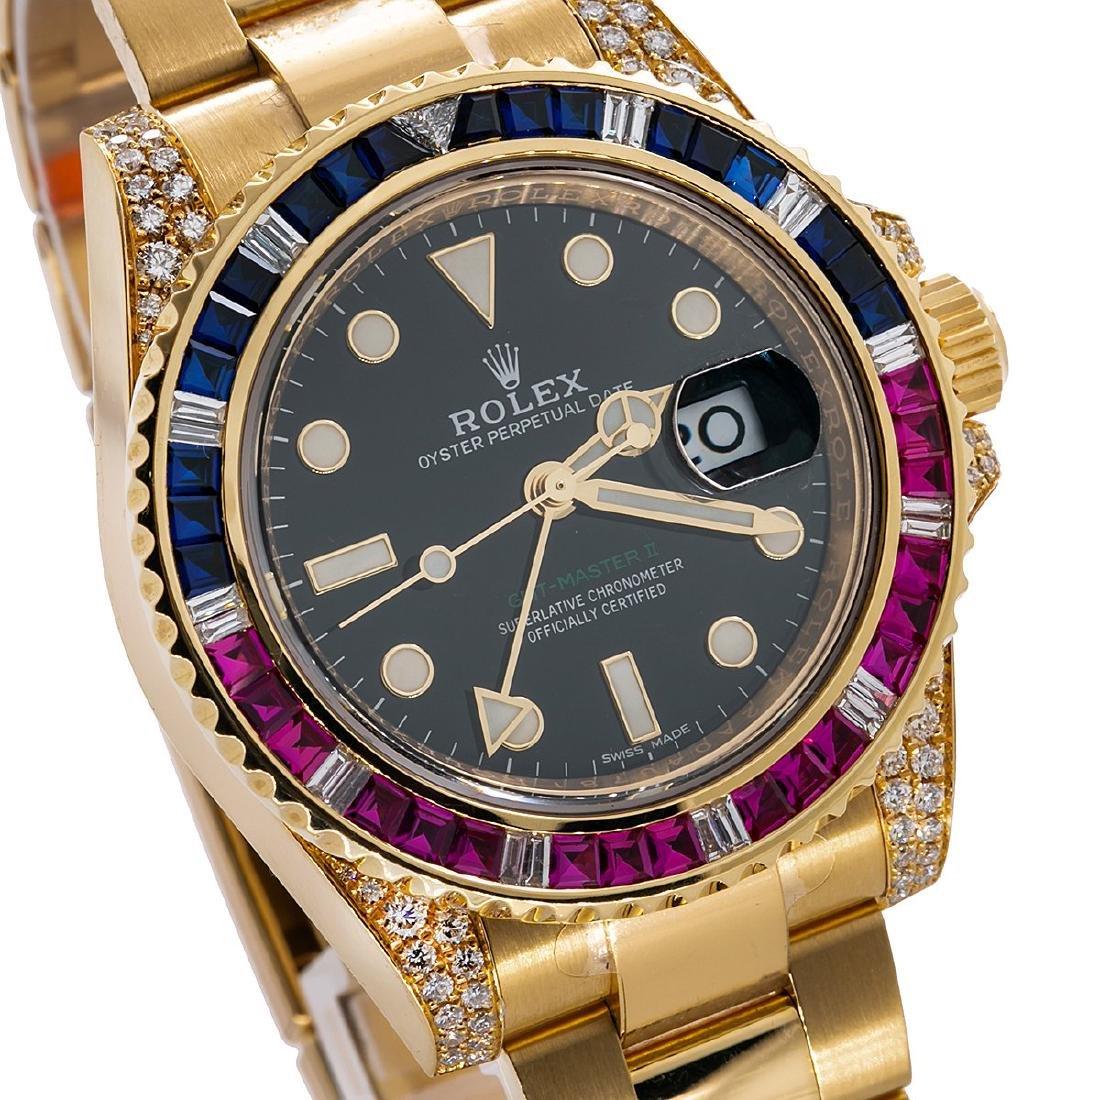 18K YELLOW GOLD ROLEX GMT MASTER II 116718 40MM BLACK - 2